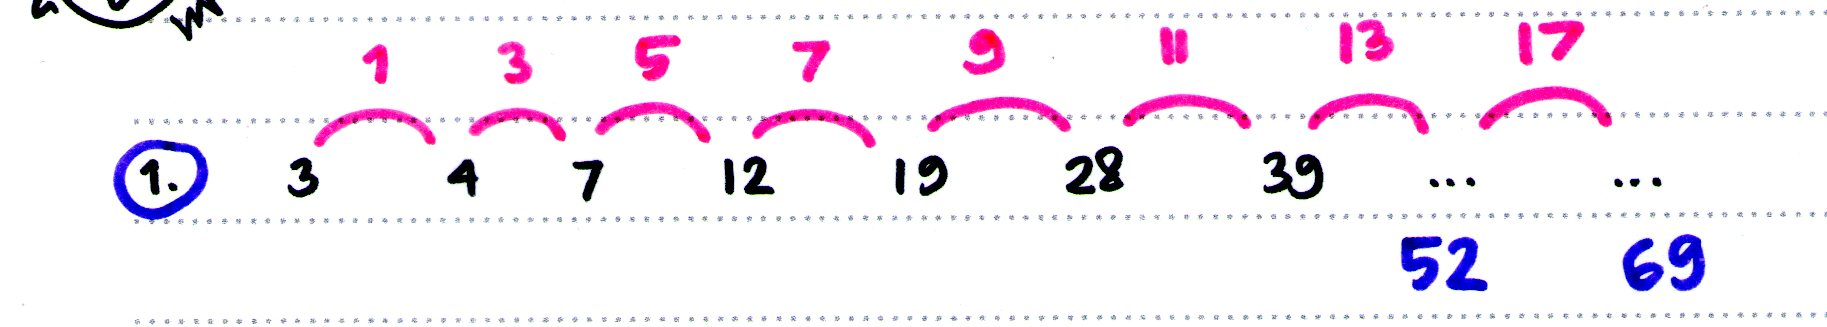 85 Contoh Contoh Soal Psikotes Dan Cara Menyelesaikannya Dengan Mudah Dan Contoh Soal